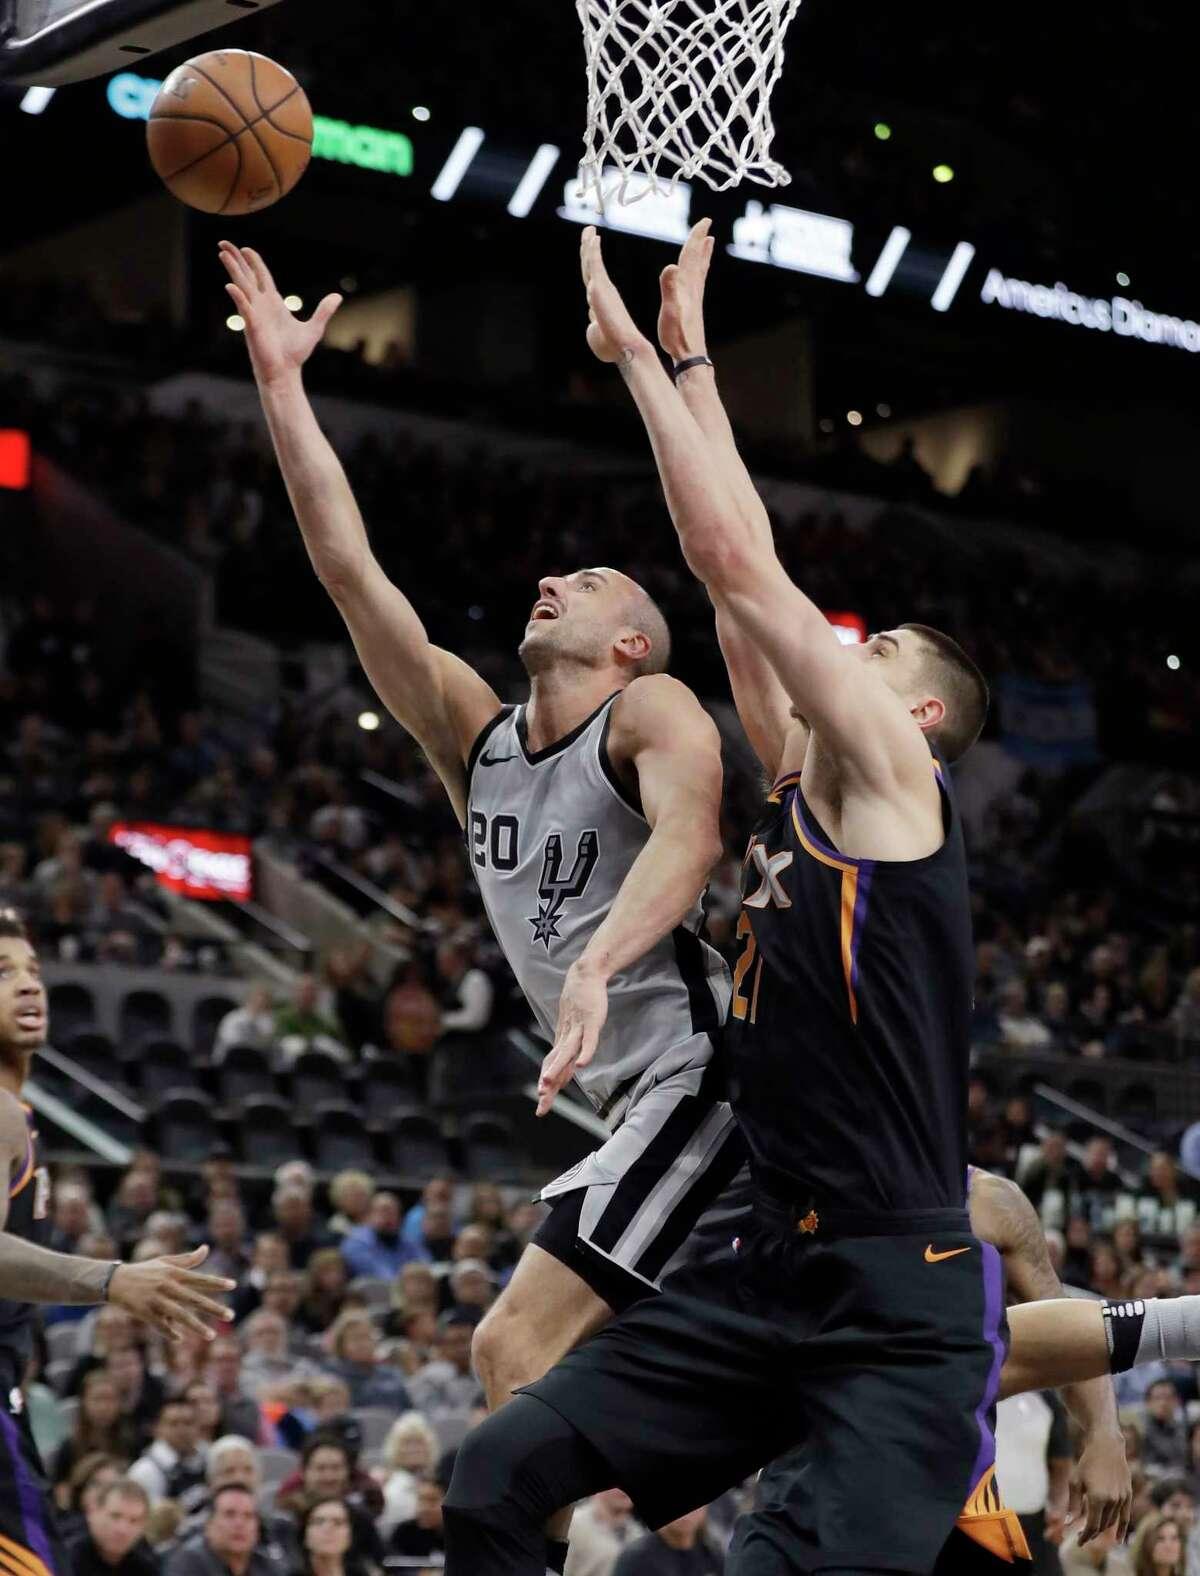 San Antonio Spurs guard Manu Ginobili (20) shoots past Phoenix Suns center Alex Len (21) during the first half of an NBA basketball game Friday, Jan. 5, 2018, in San Antonio. (AP Photo/Eric Gay)